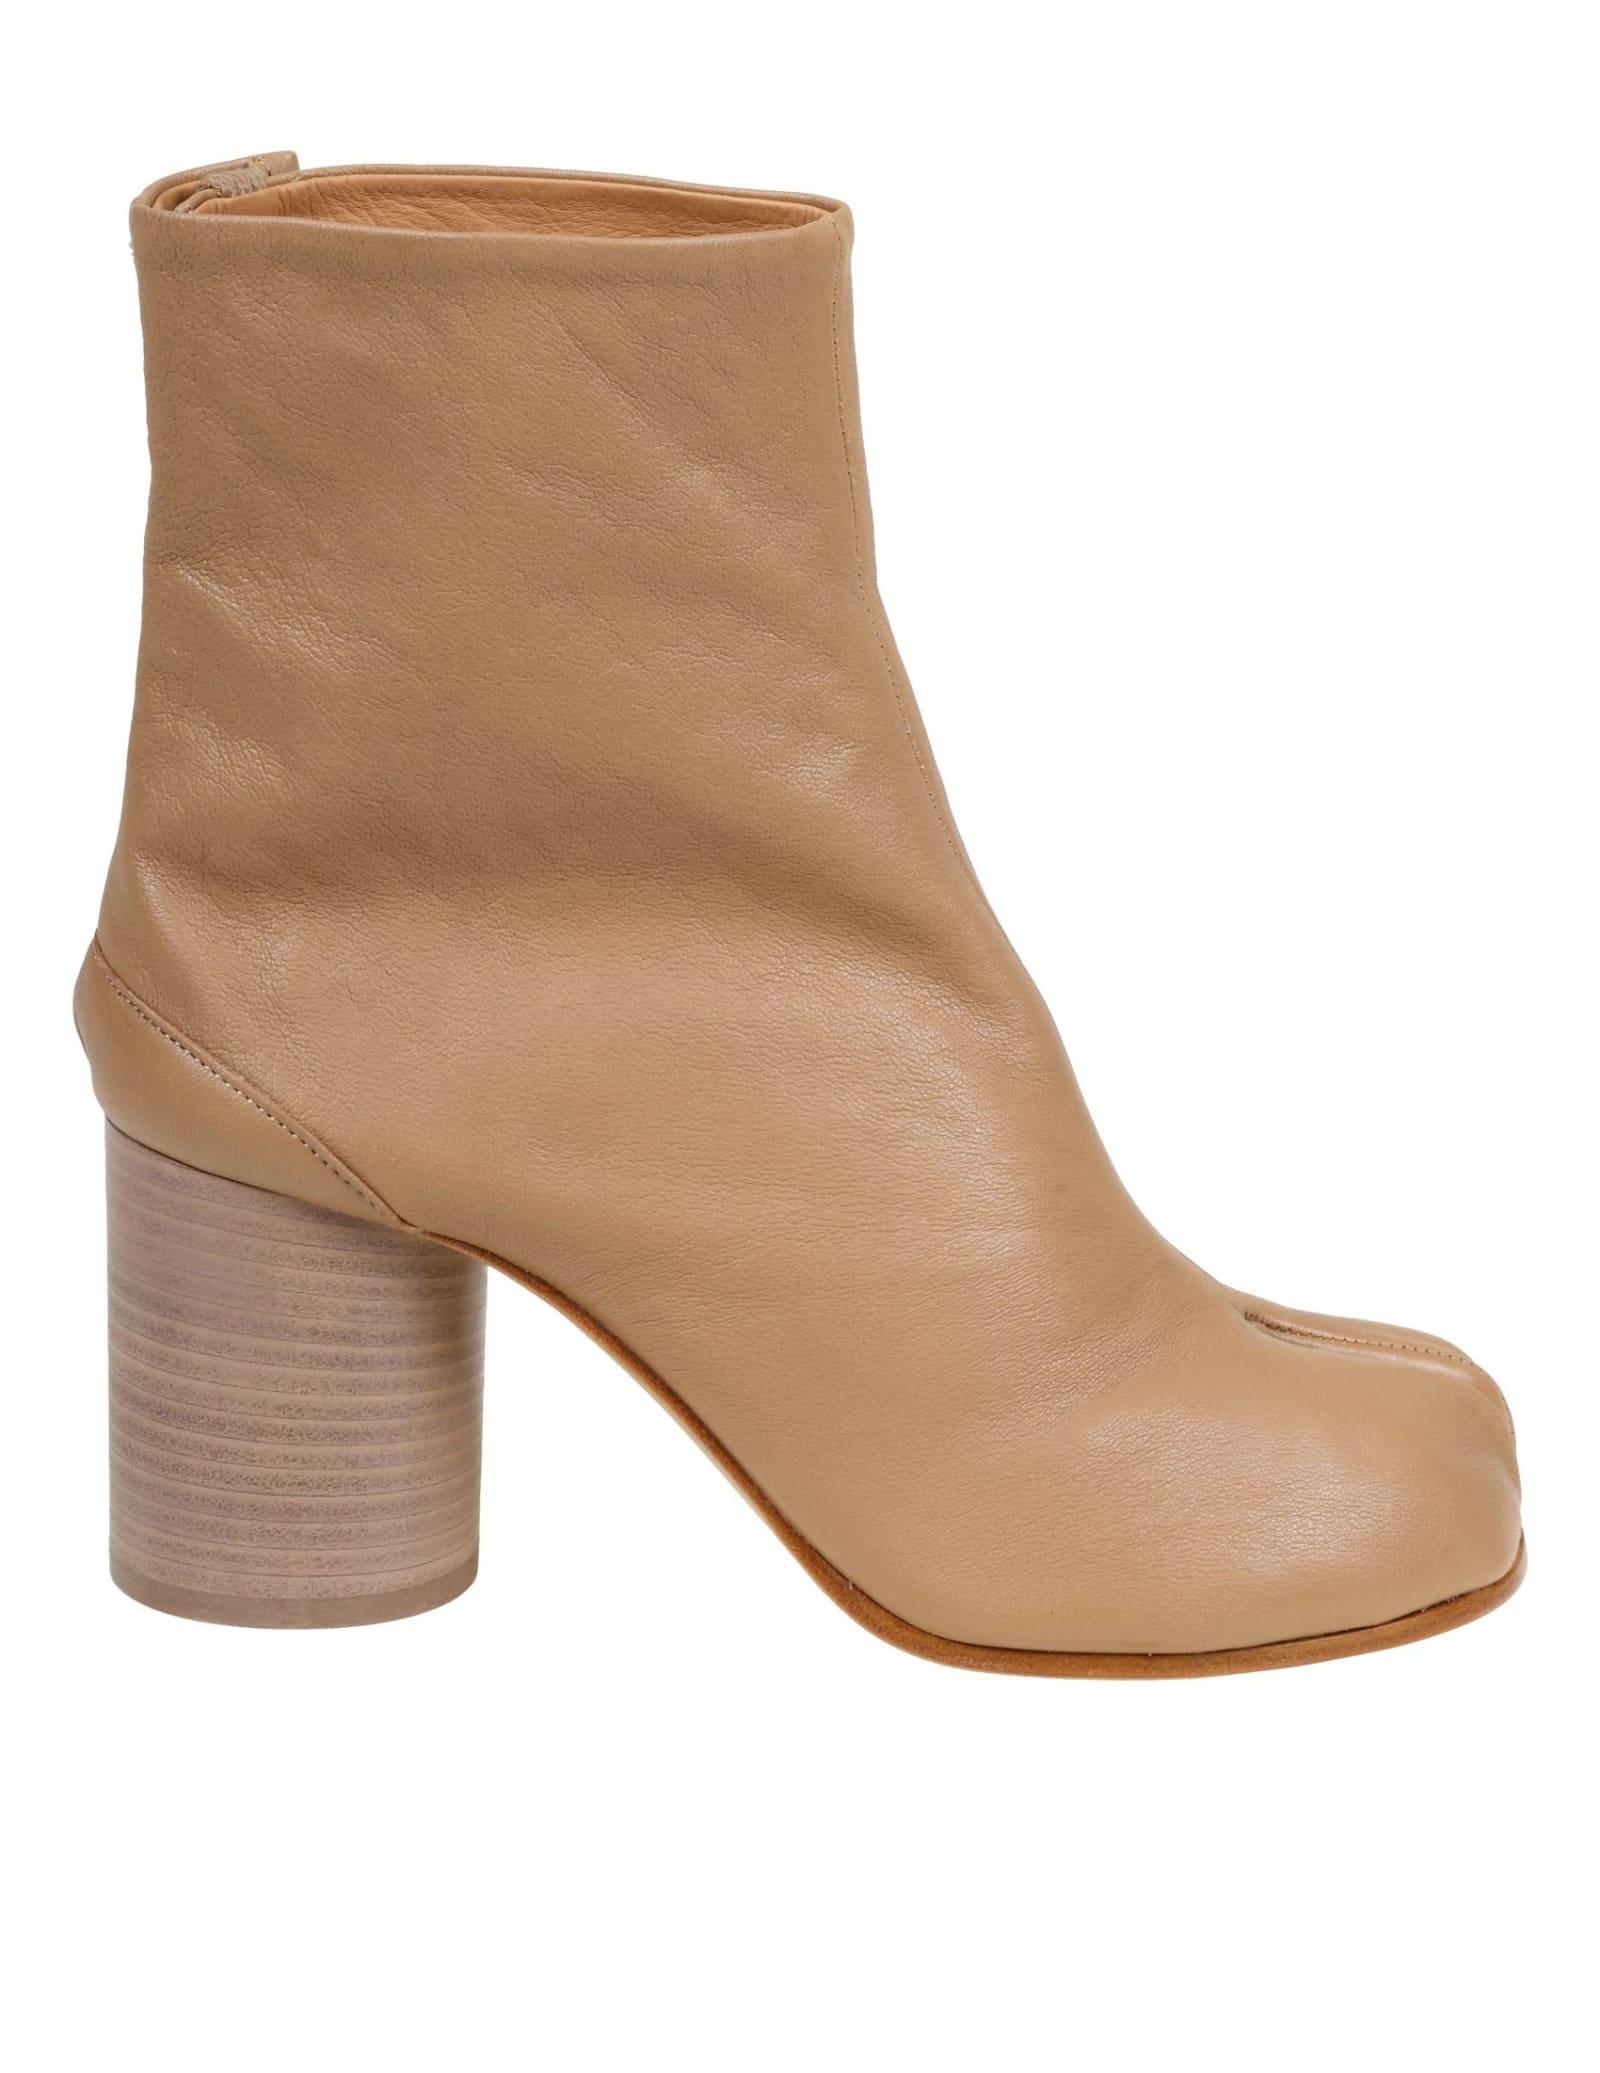 Buy Maison Margiela Ankle Boots Tabi online, shop Maison Margiela shoes with free shipping